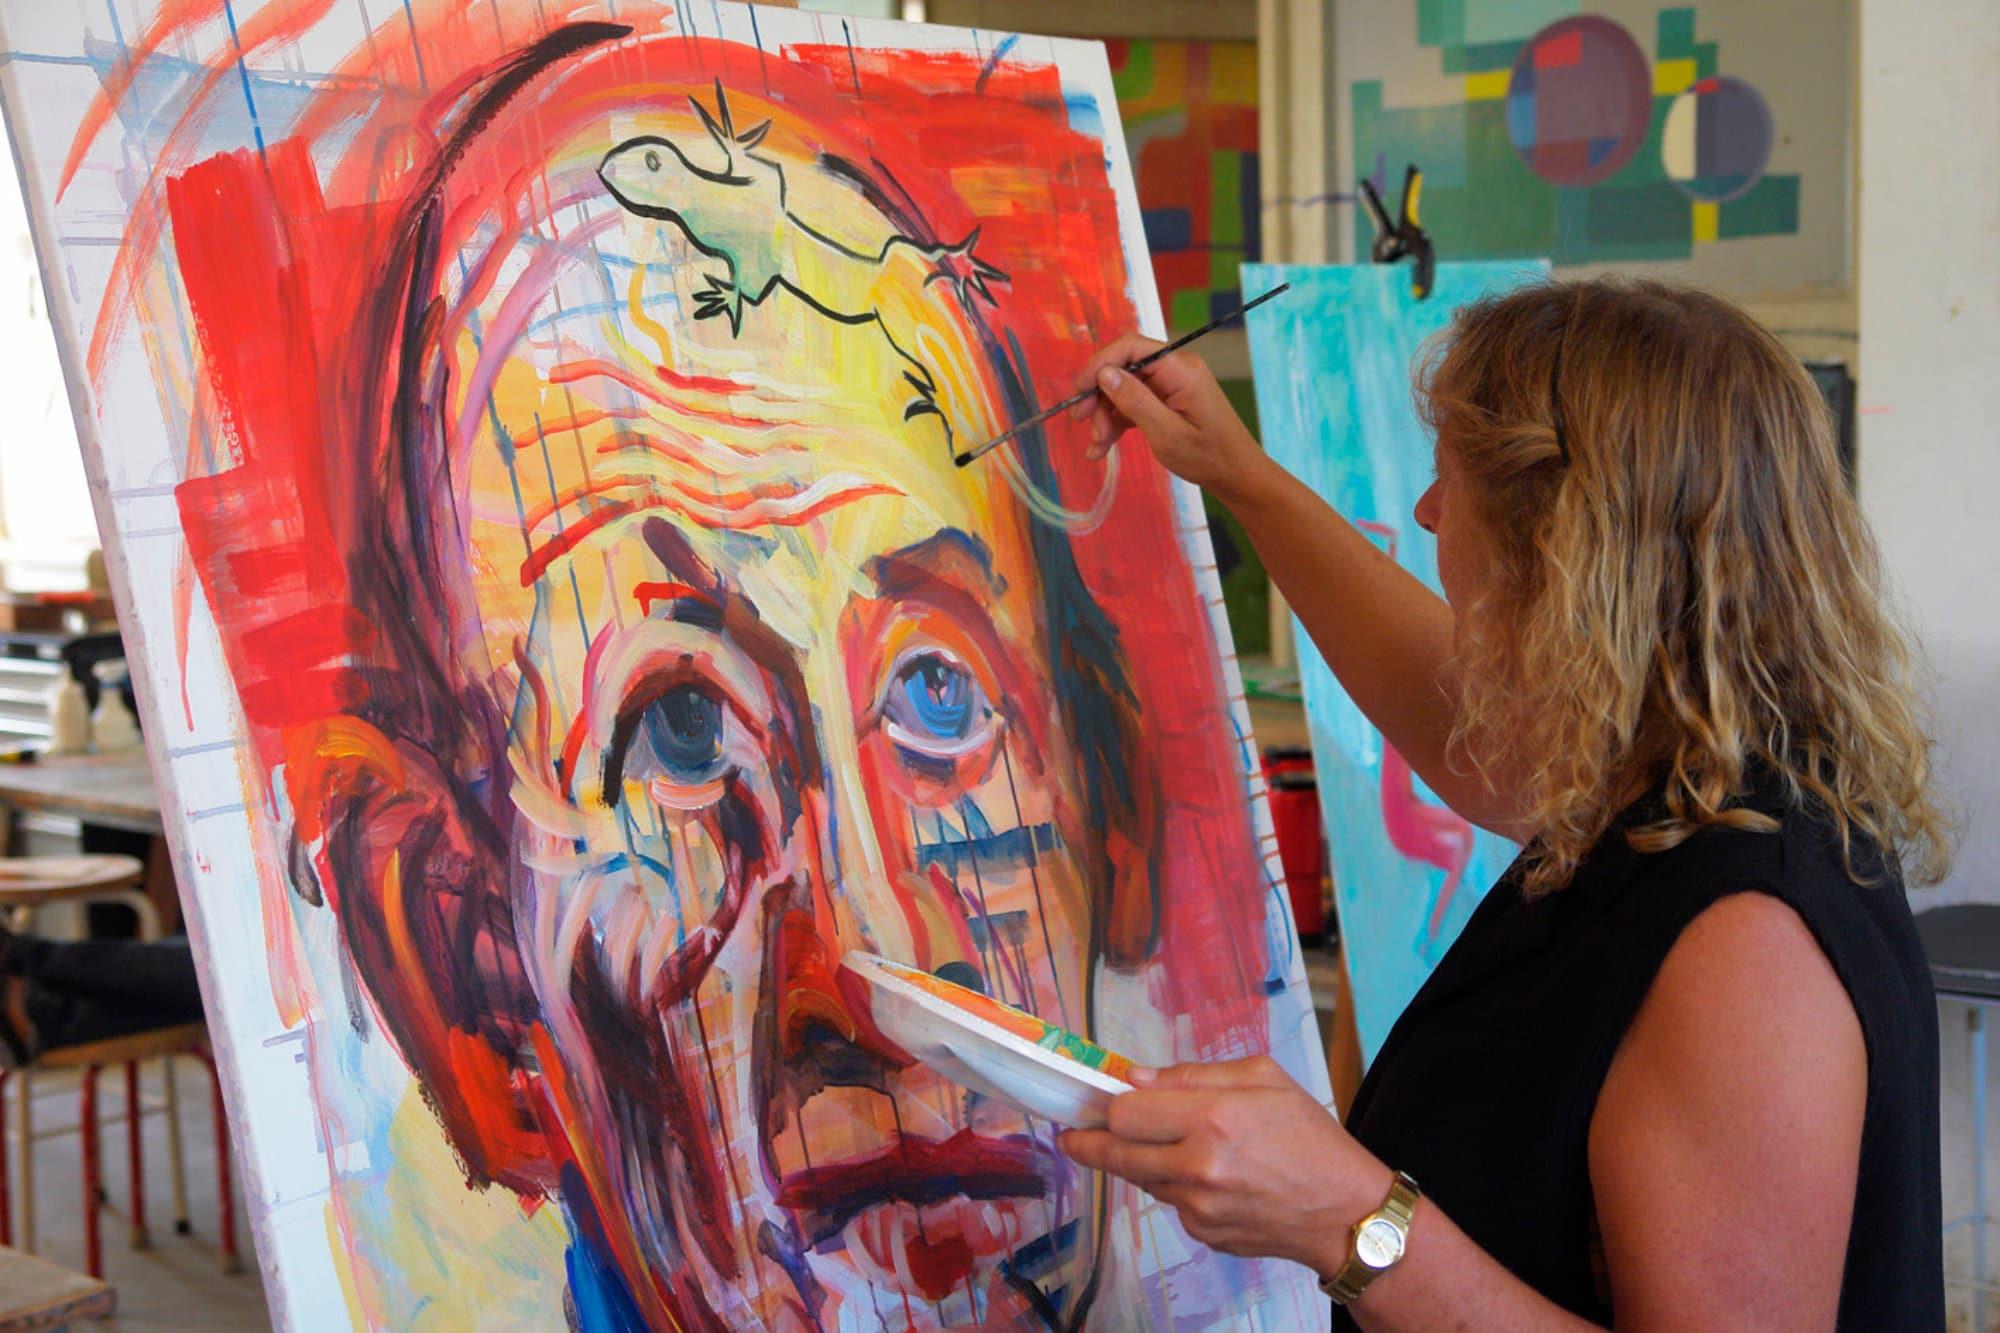 Maleri - Farver og fantasi med Fadavi